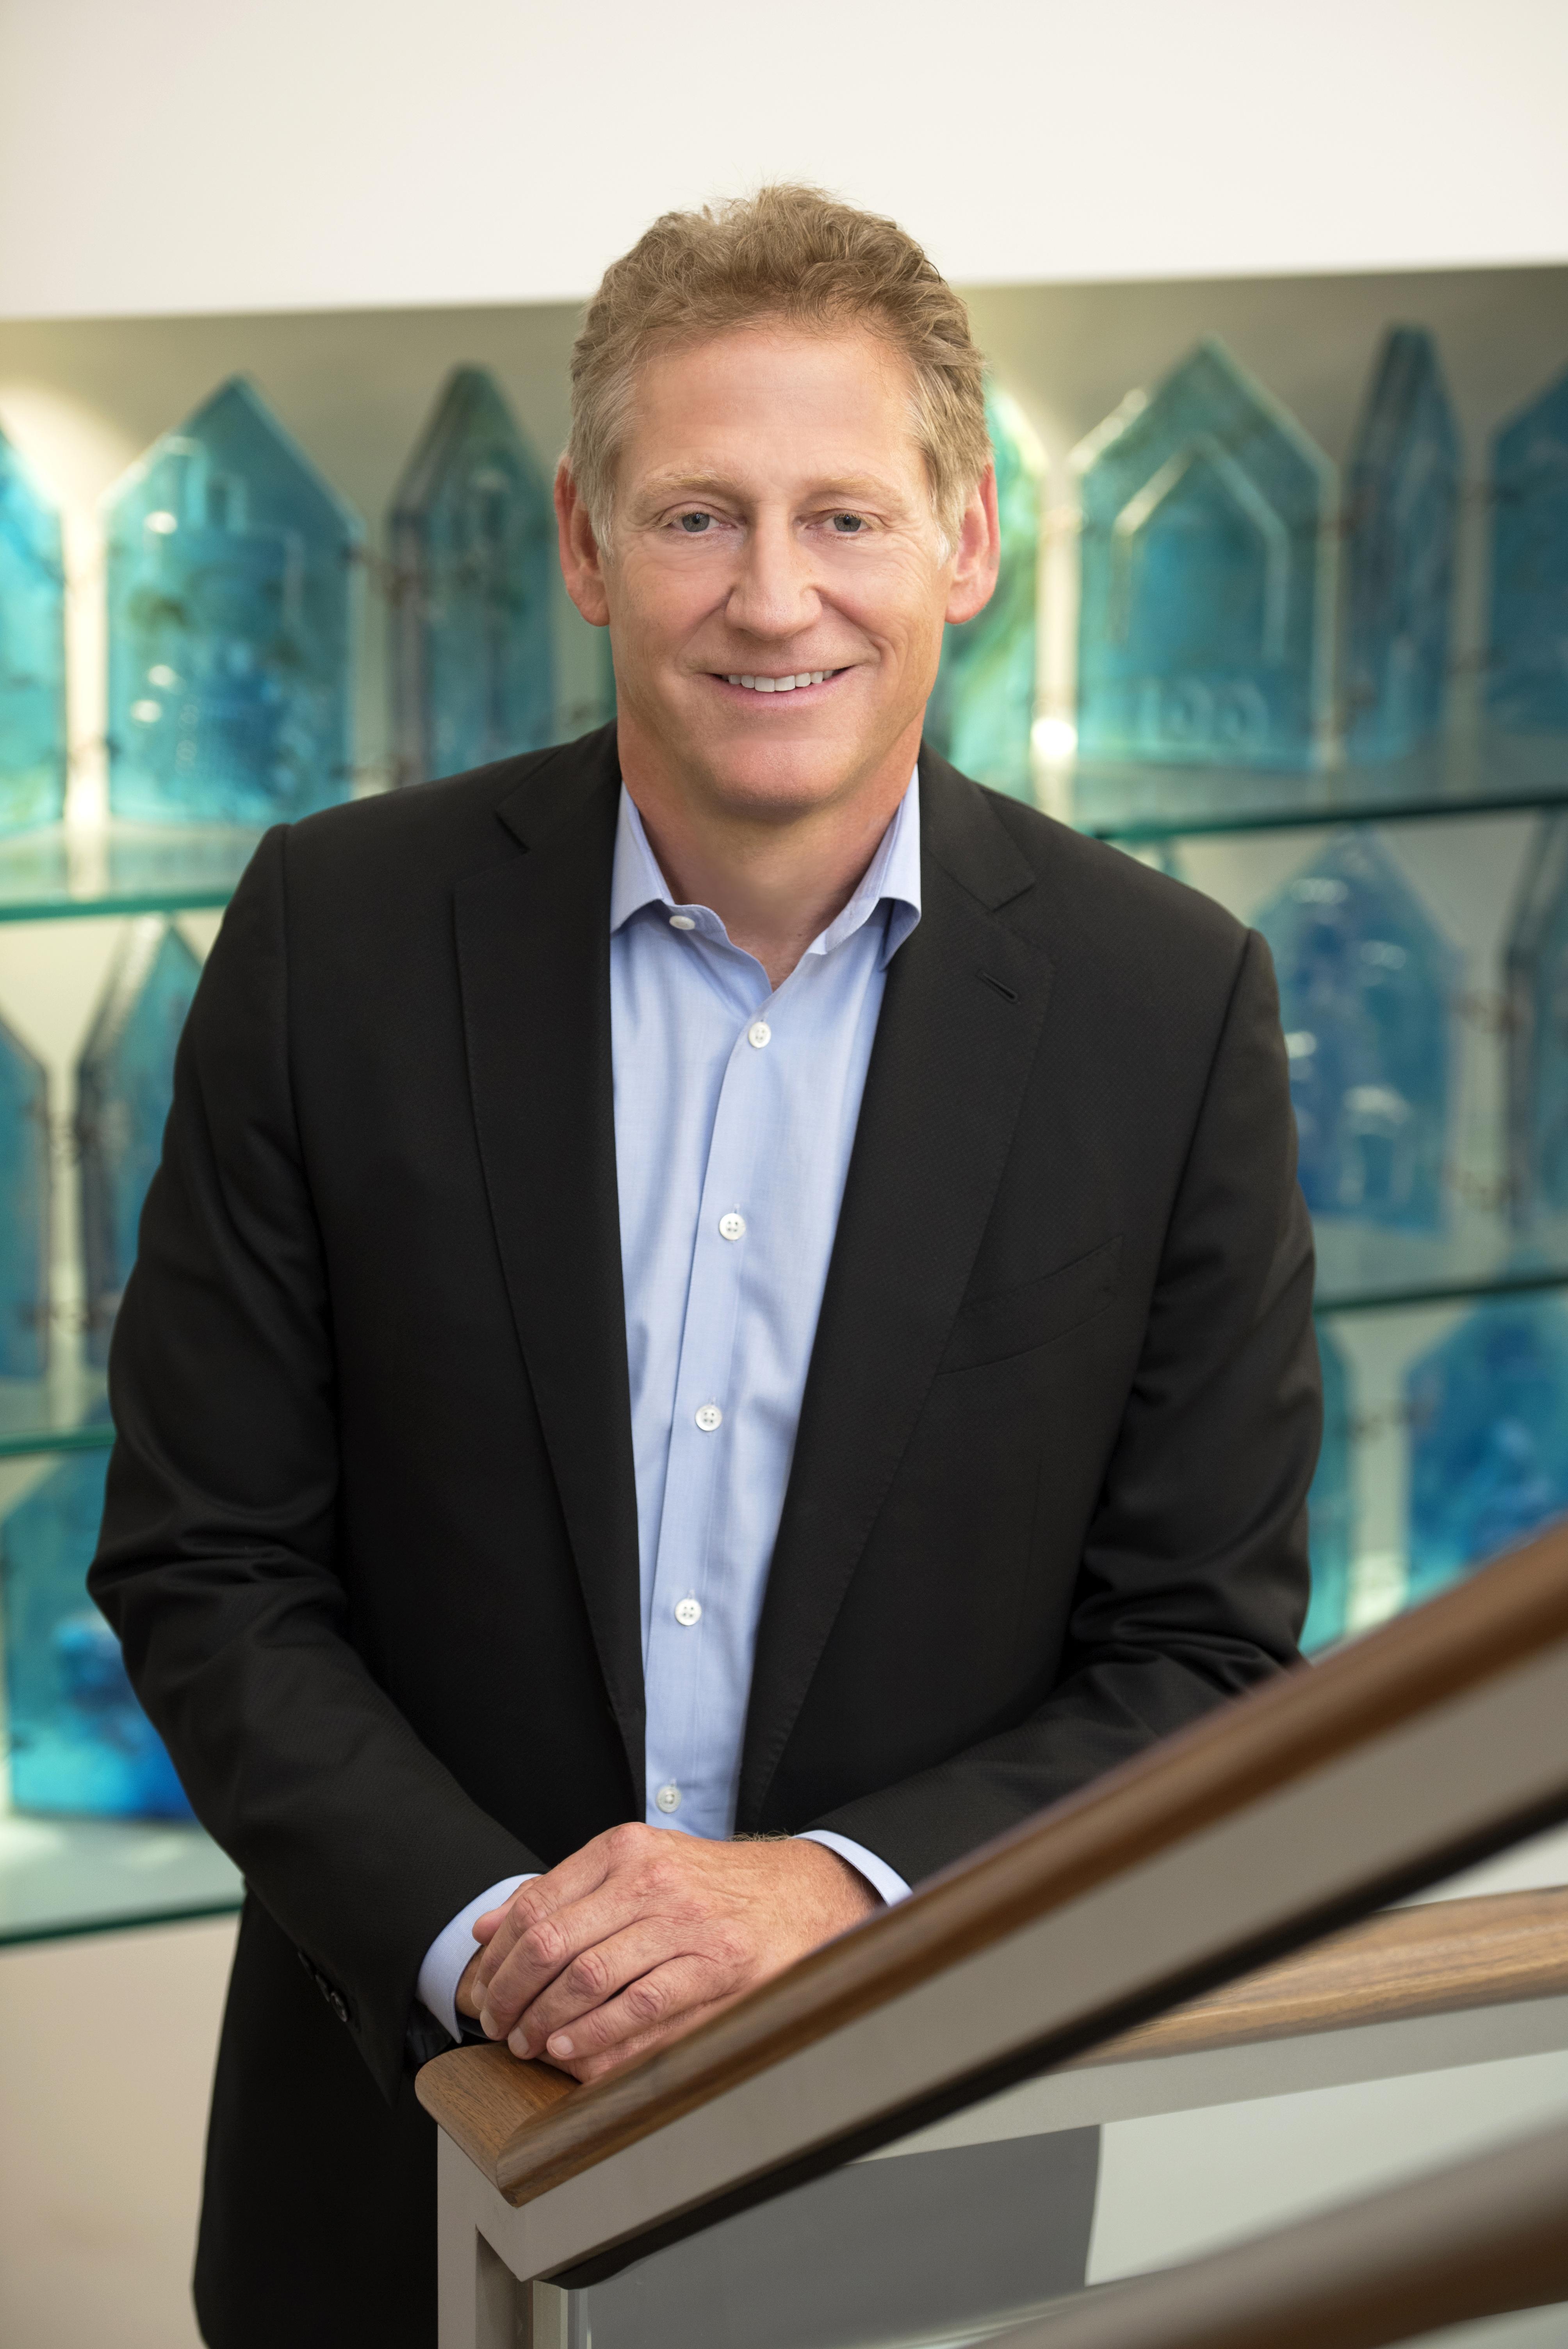 Kent Masters, CEO of Albemarle